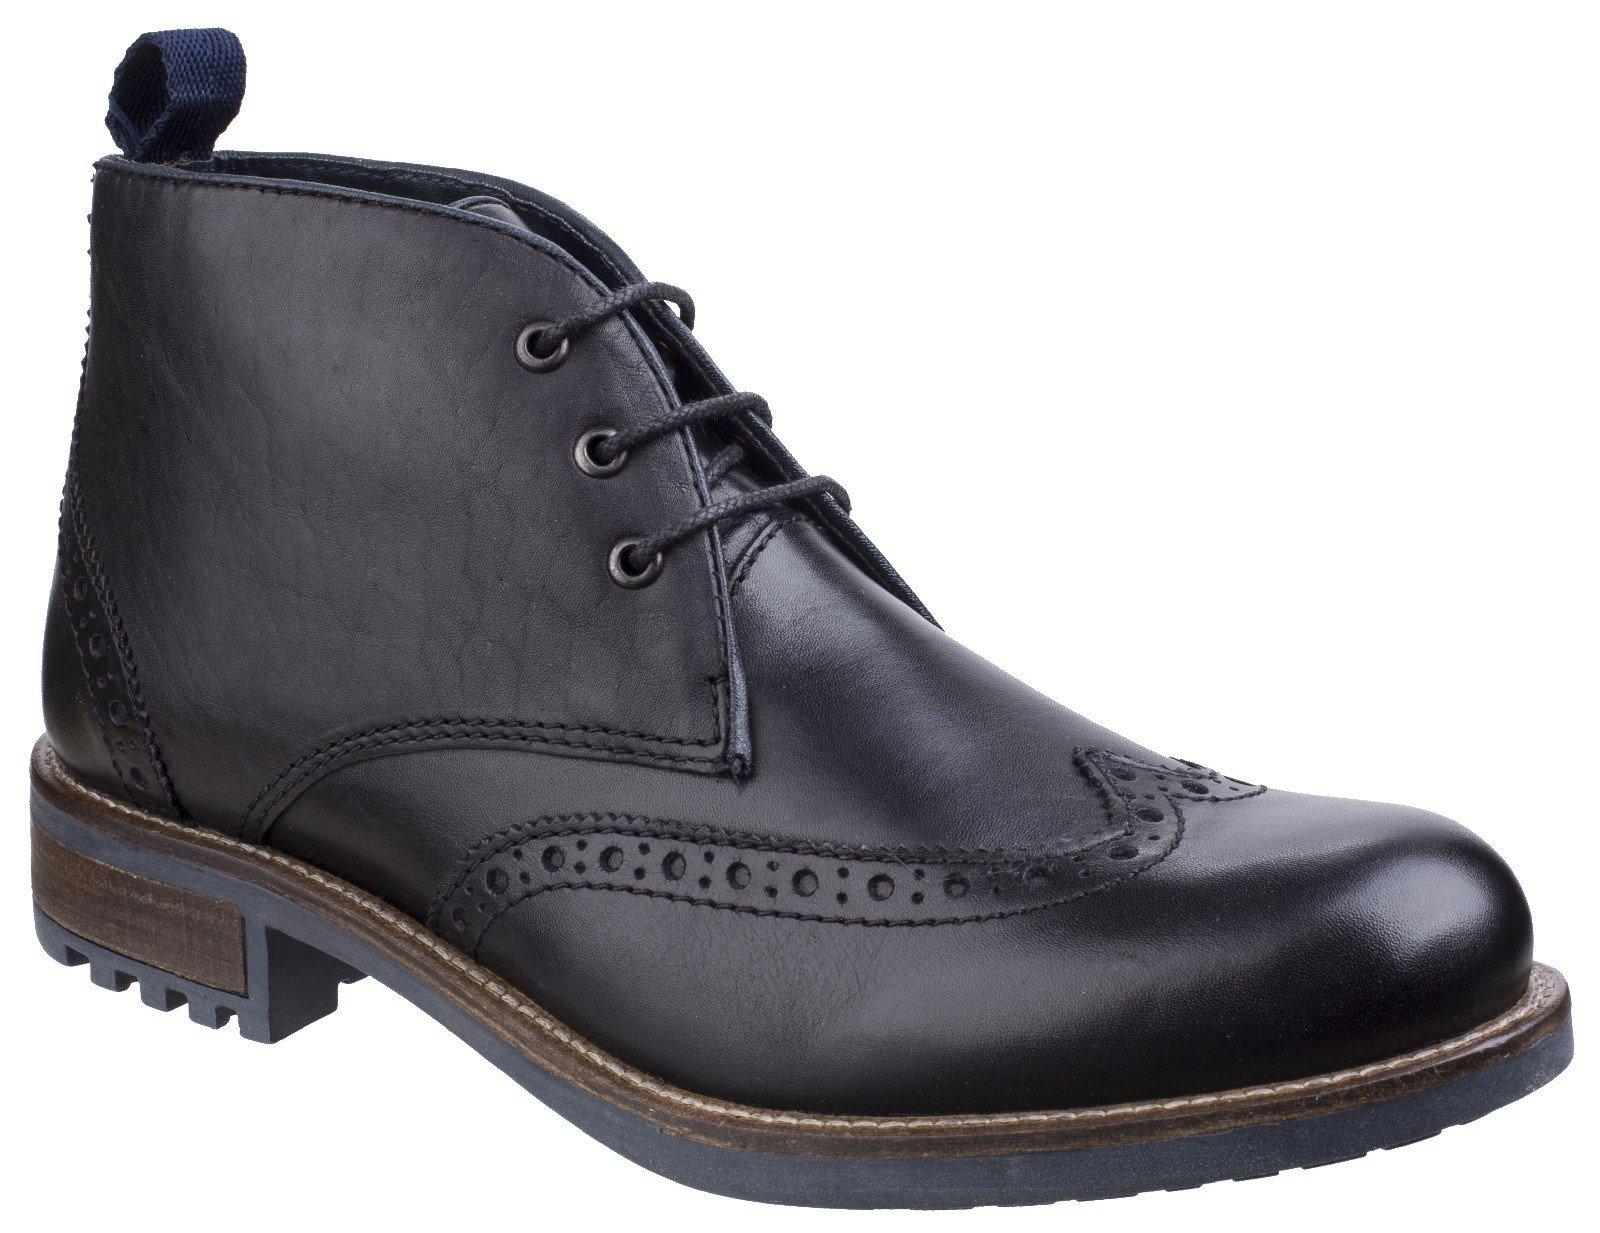 Cotswold Men's Avening Brogue Chukka Boot Various Colours 25528 - Black 6